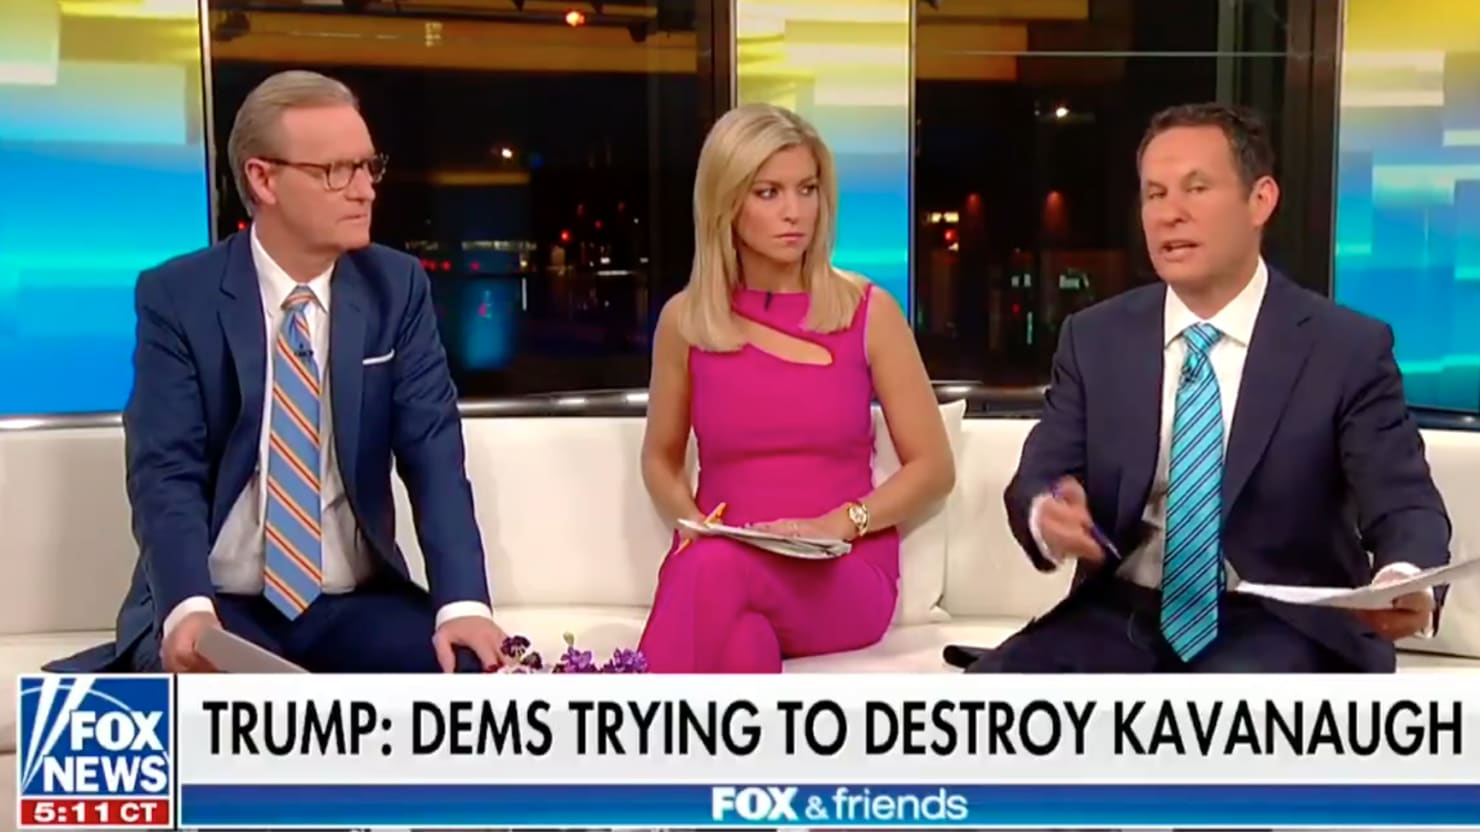 'Fox & Friends': Trump 'Blew It' by Mocking Christine Blasey Ford